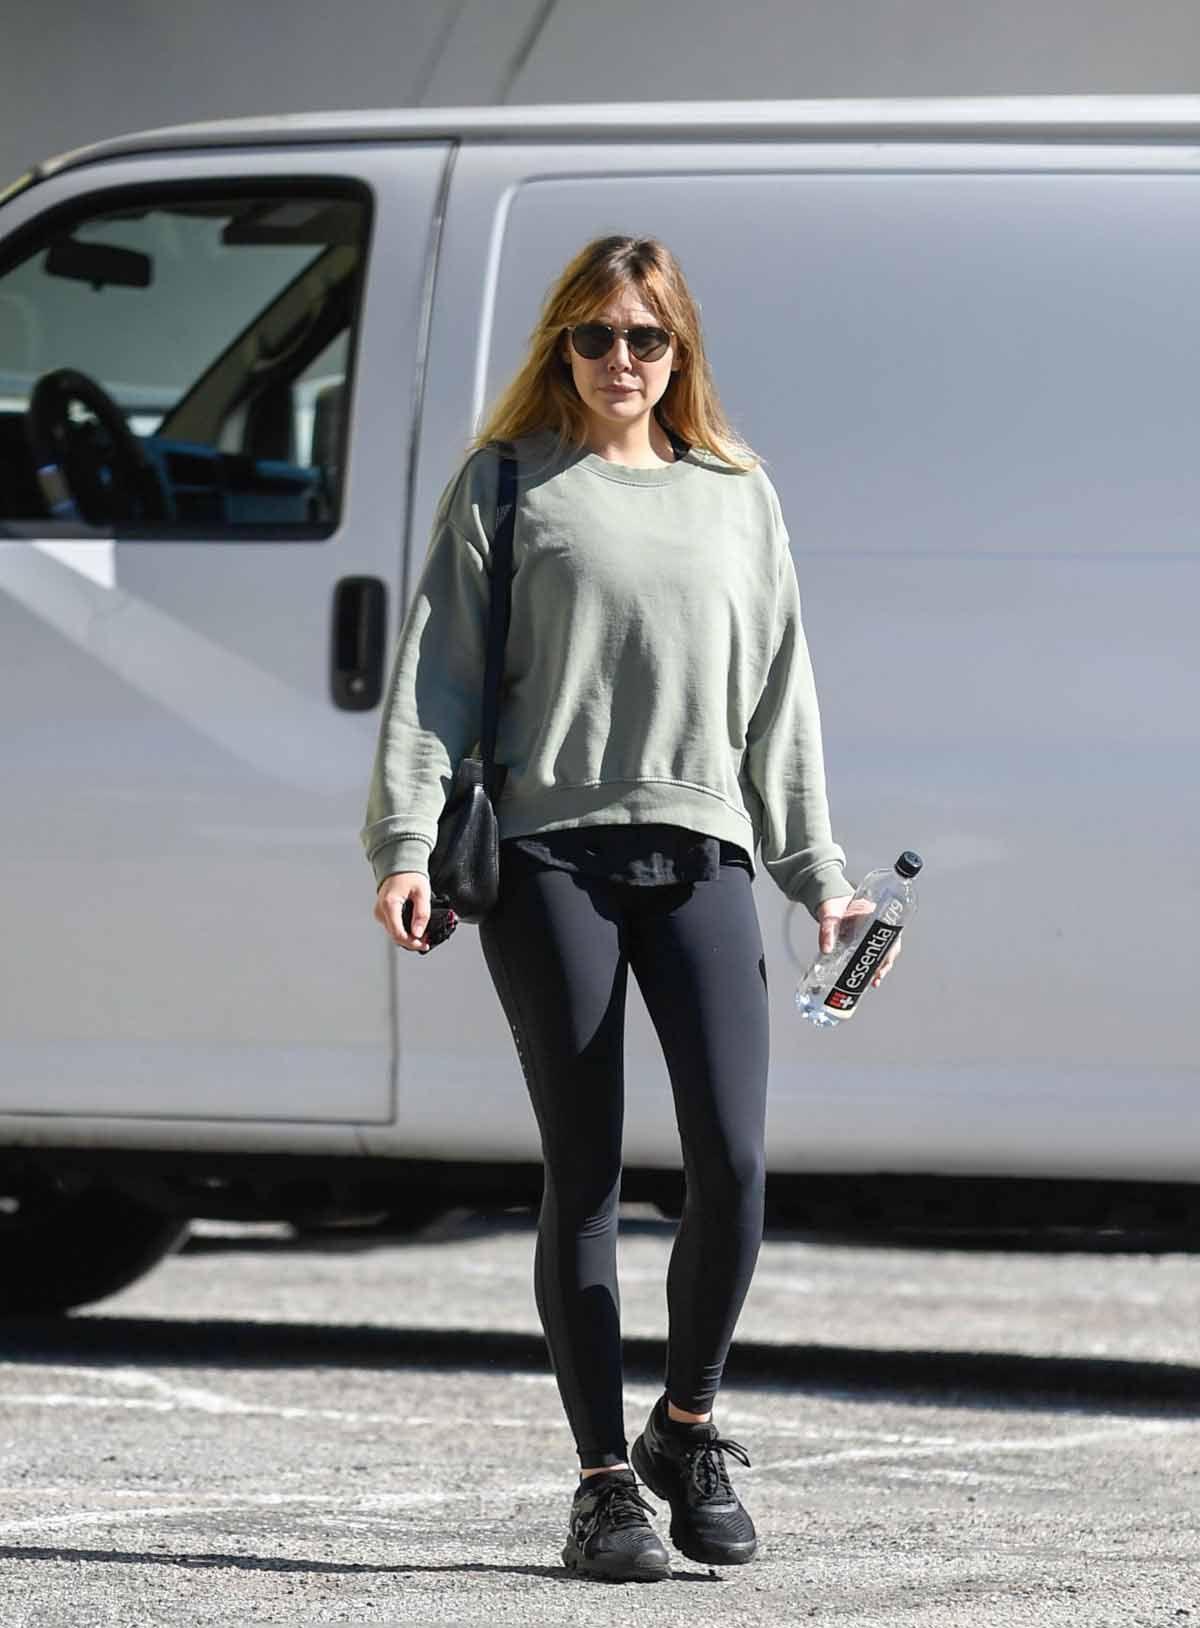 fc3c485fd9ed8 Elizabeth Olsen Workout Time-Los Angeles 25-01-2019 | CELEBRITIES ...